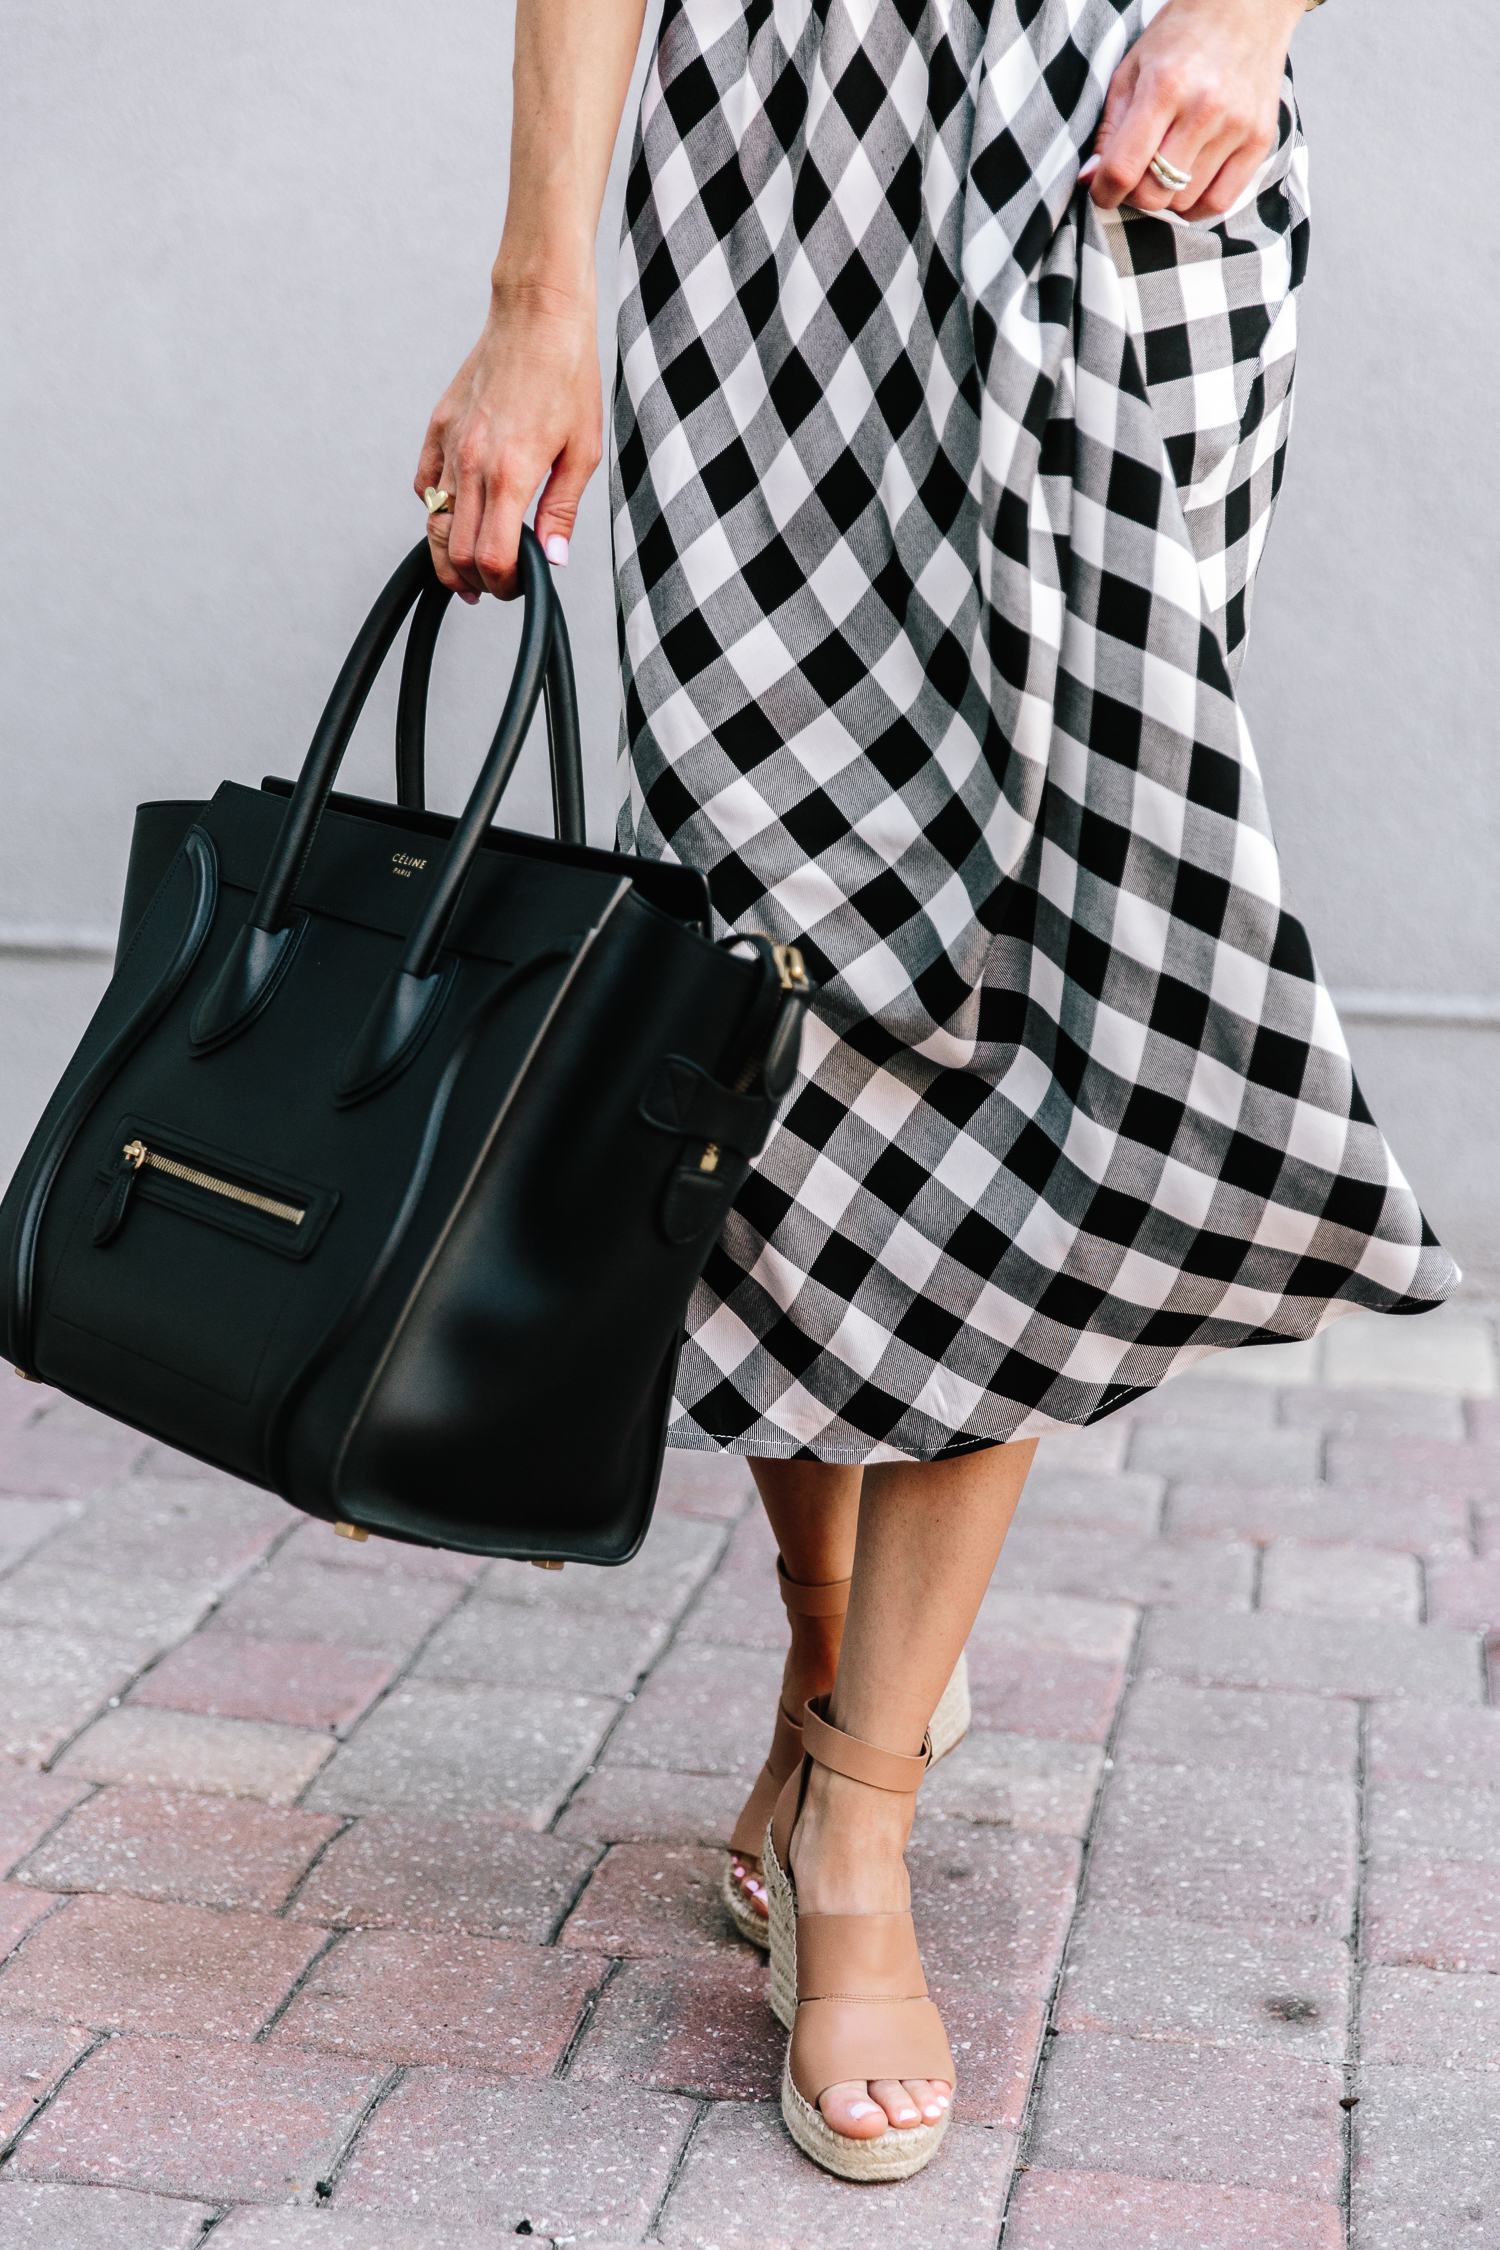 gingham, nordstrom, spring trends, celine handbag, spring dresses, statement earrings